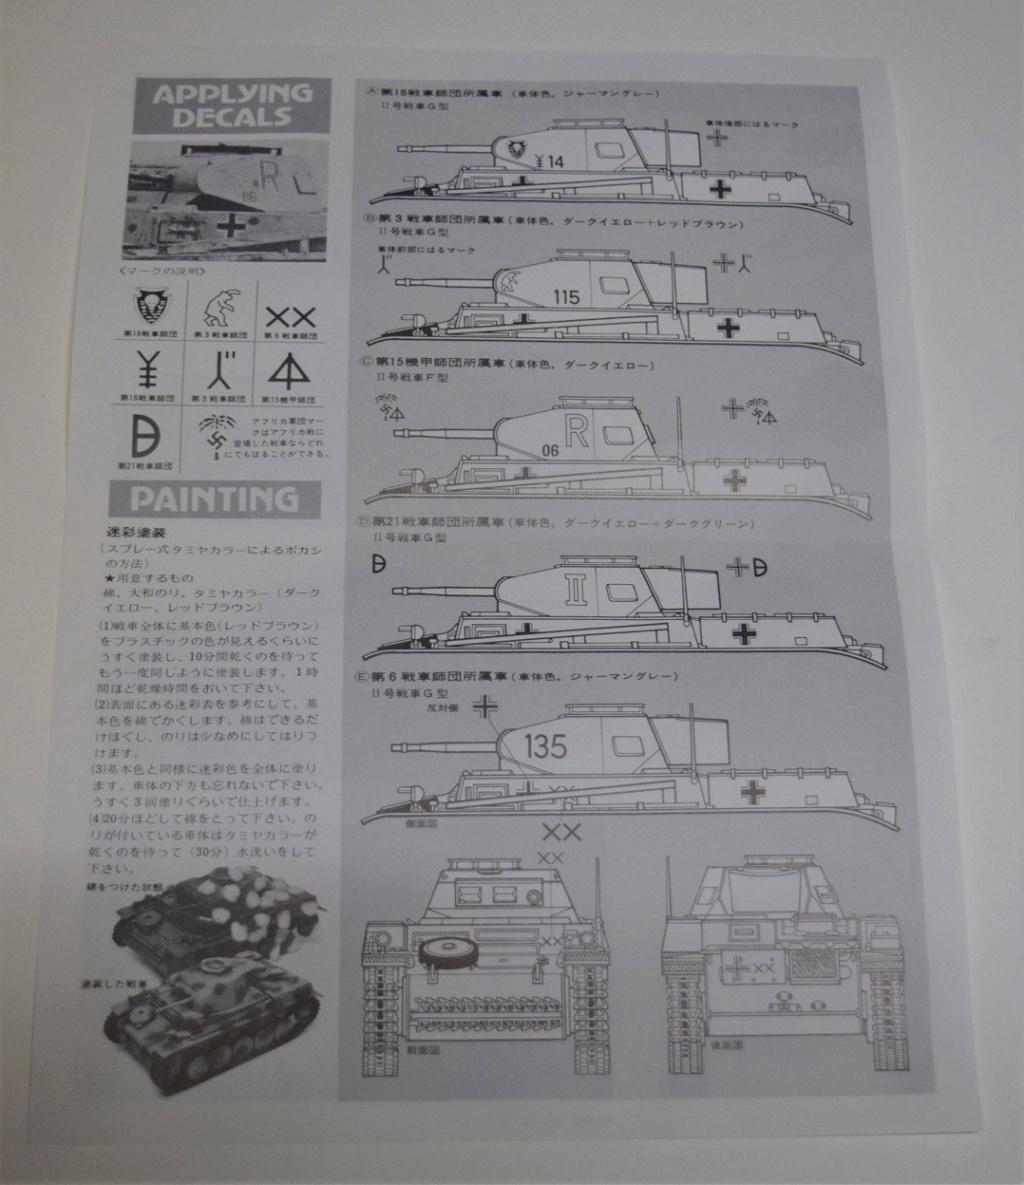 Fil rouge 2021 * Panzer Kampfwagen II Ausf. F/ G au 1/35 - TAMIYA - 1971 - *** Terminé en pg 3 Dsc_0323